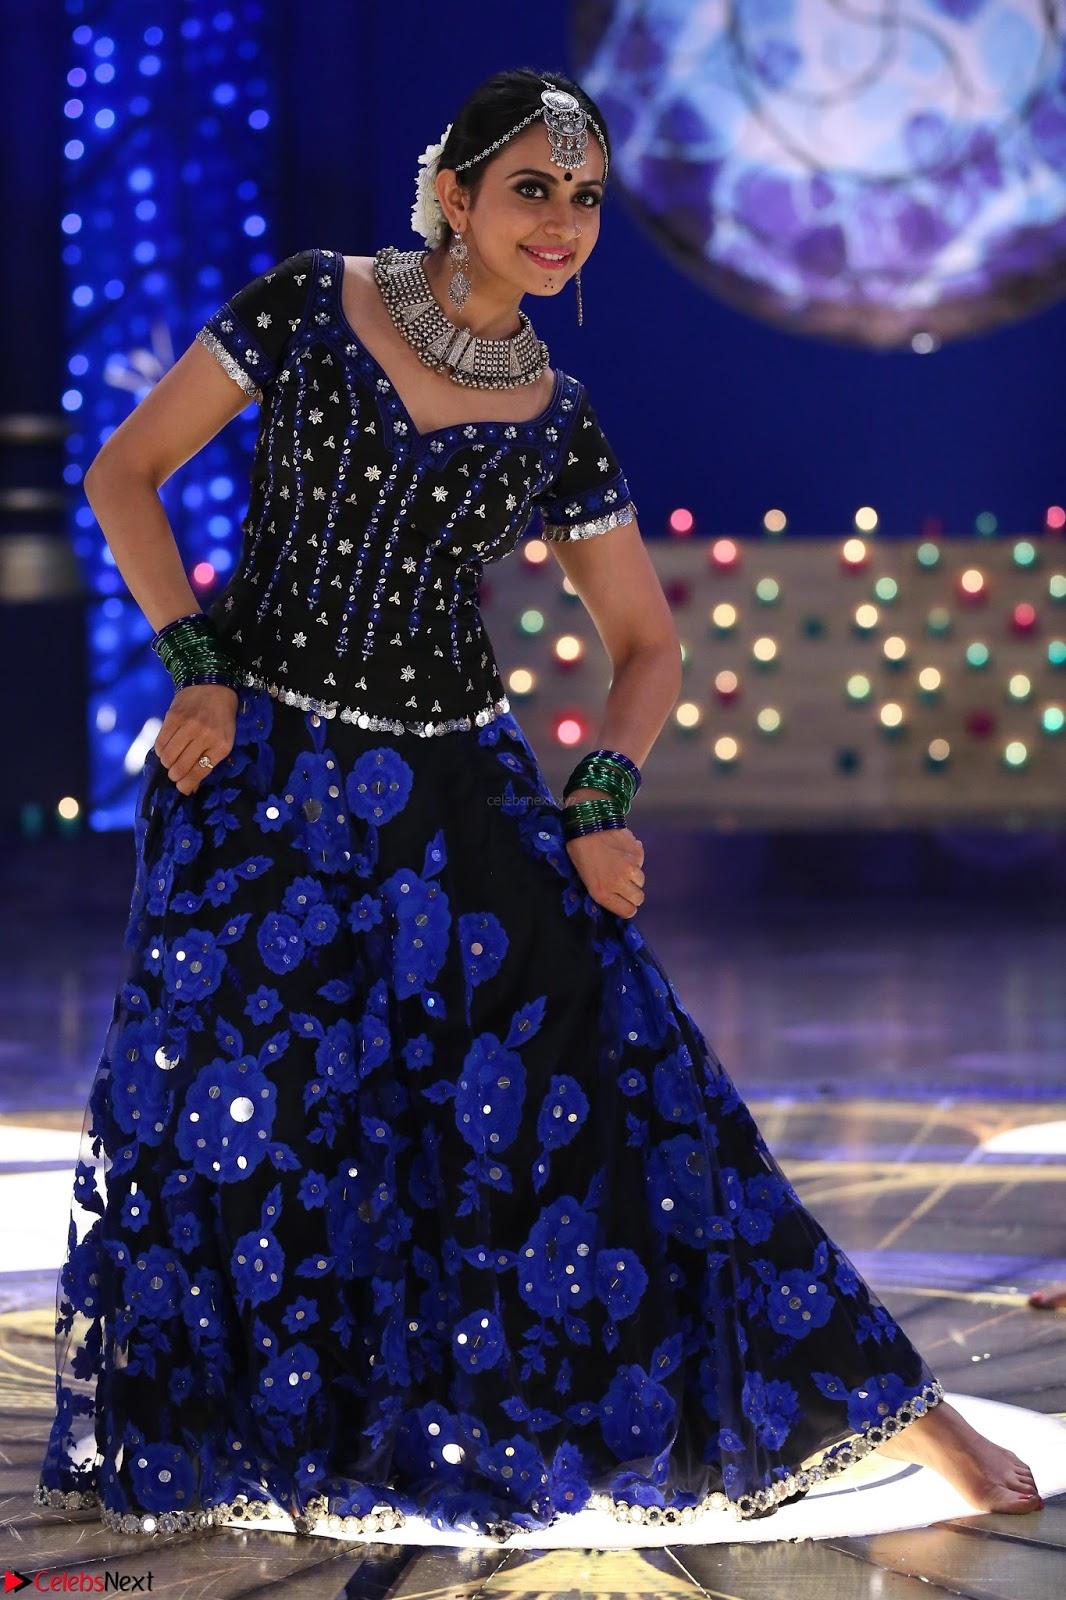 Rakul Preet Singh dance in Blue and yellow choli HD Pics from Movie Winner feb 2017